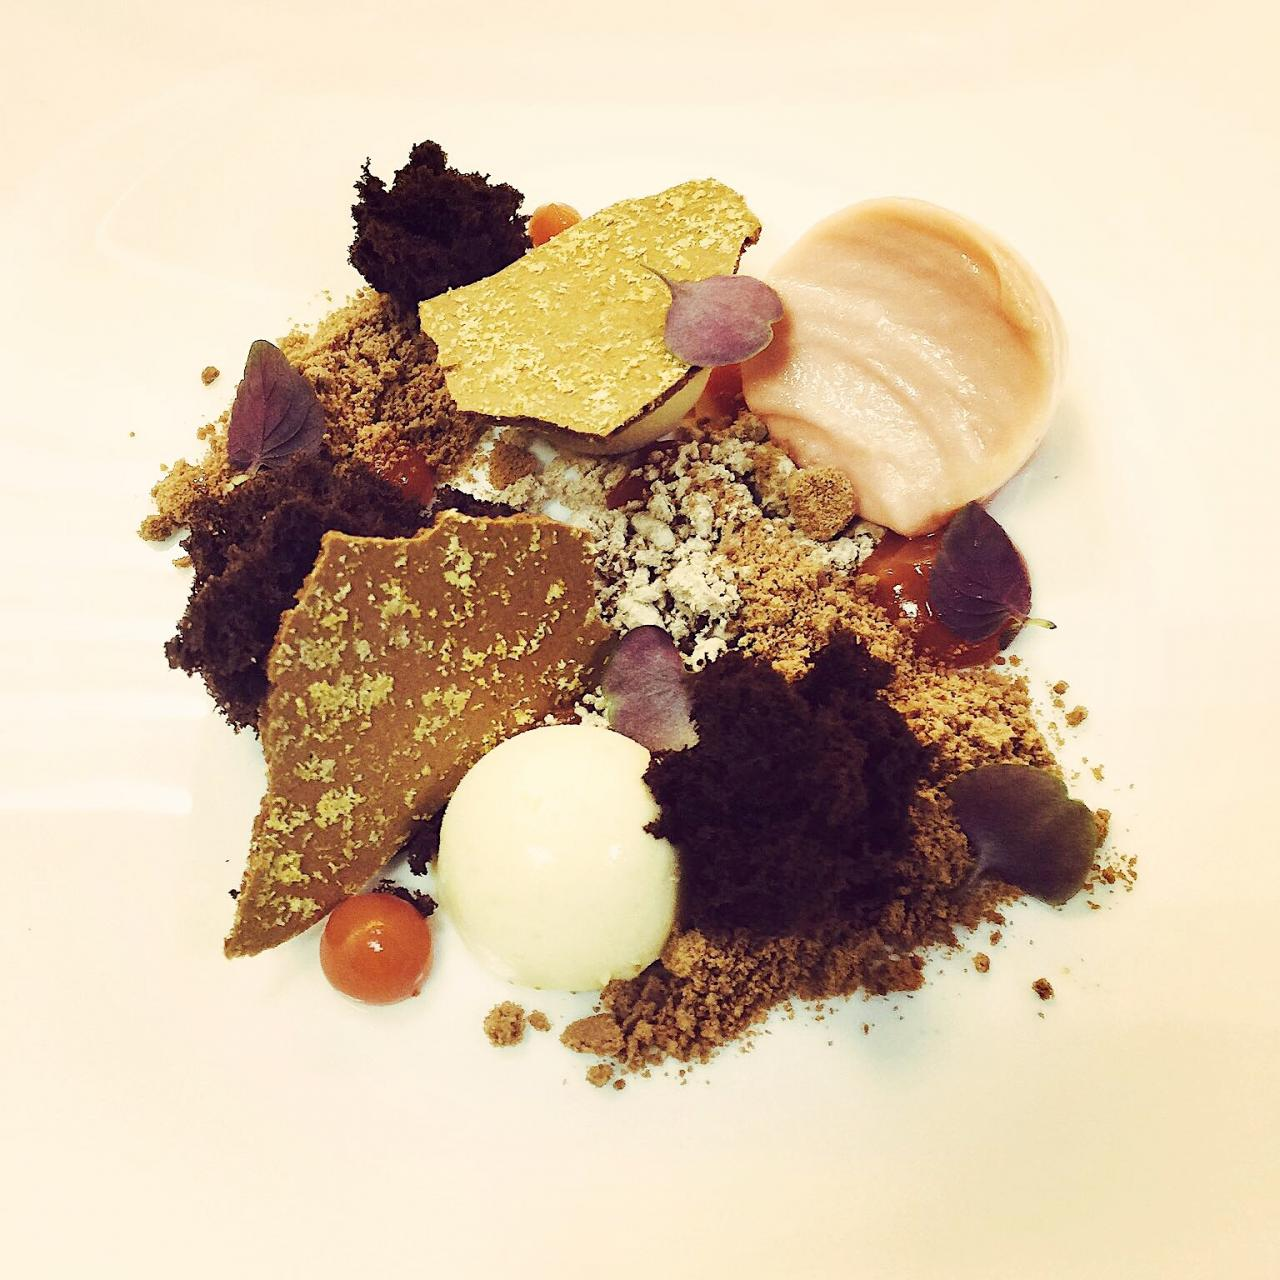 Chocolate cremeaux, peanut butter parfait Green mandarin sorbet  Chocolate mélilot soil (sweet clover), dehydrated chocolate, chocolate powder